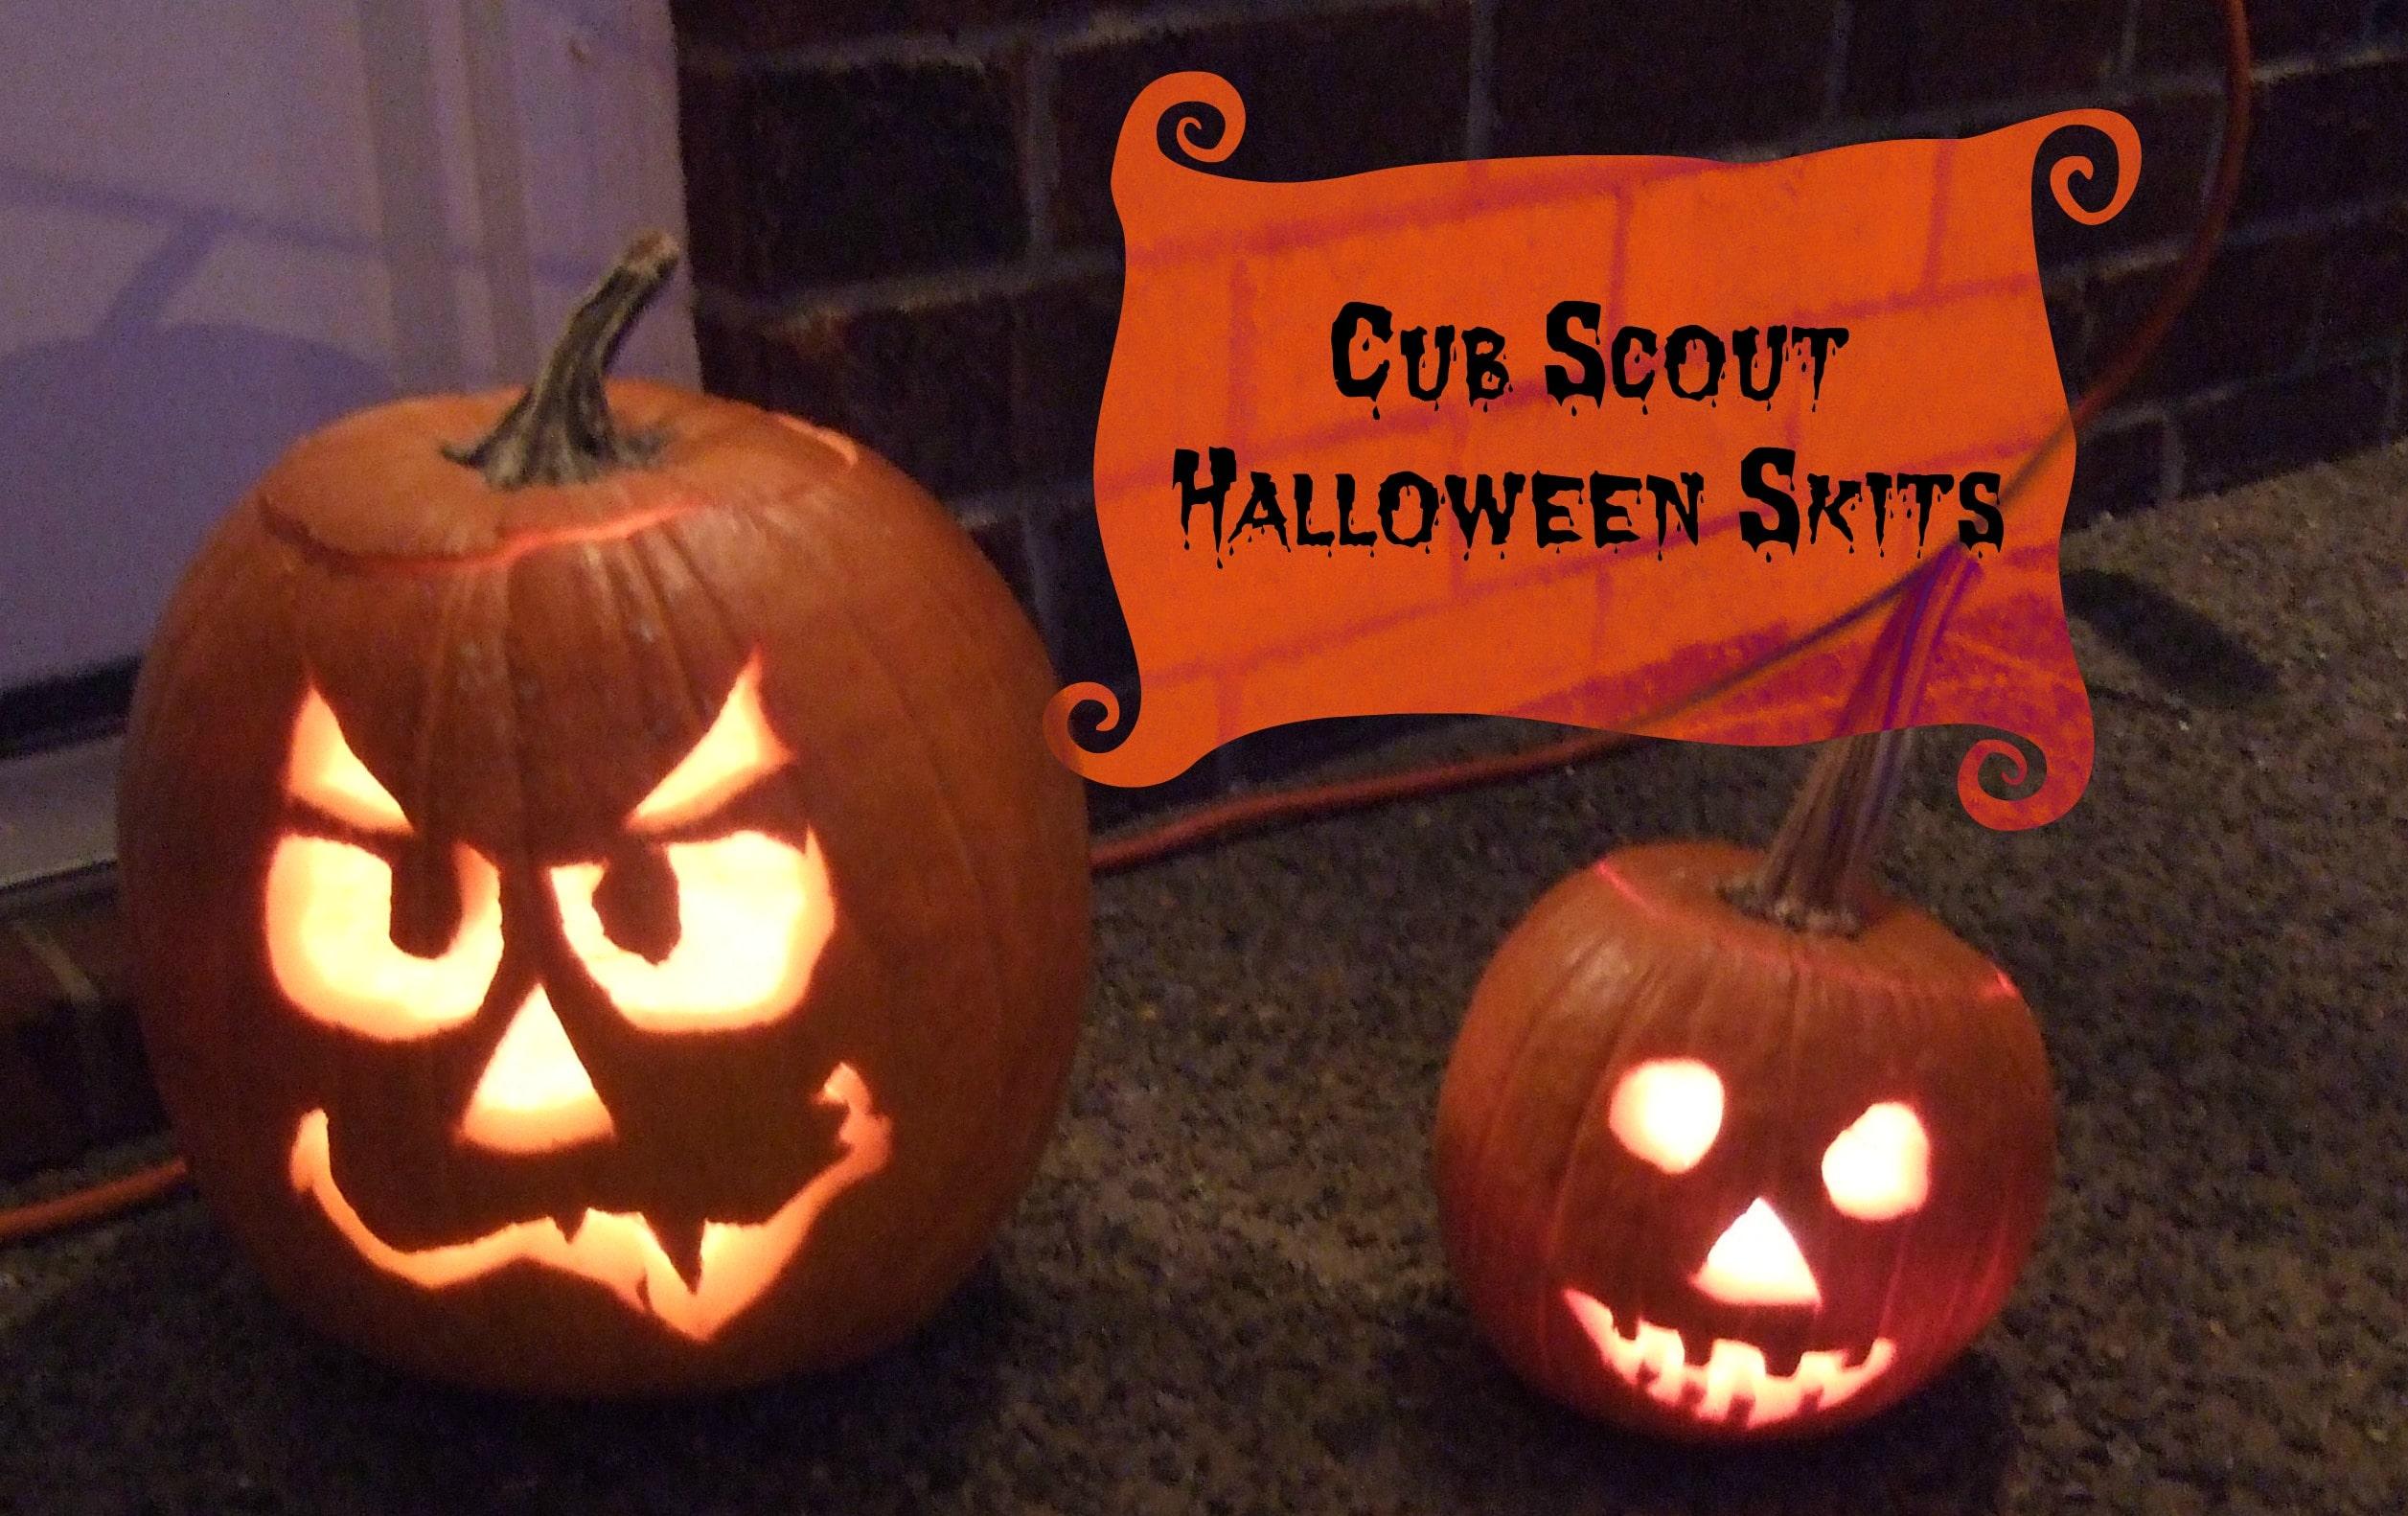 Cub Scout Halloween Skits